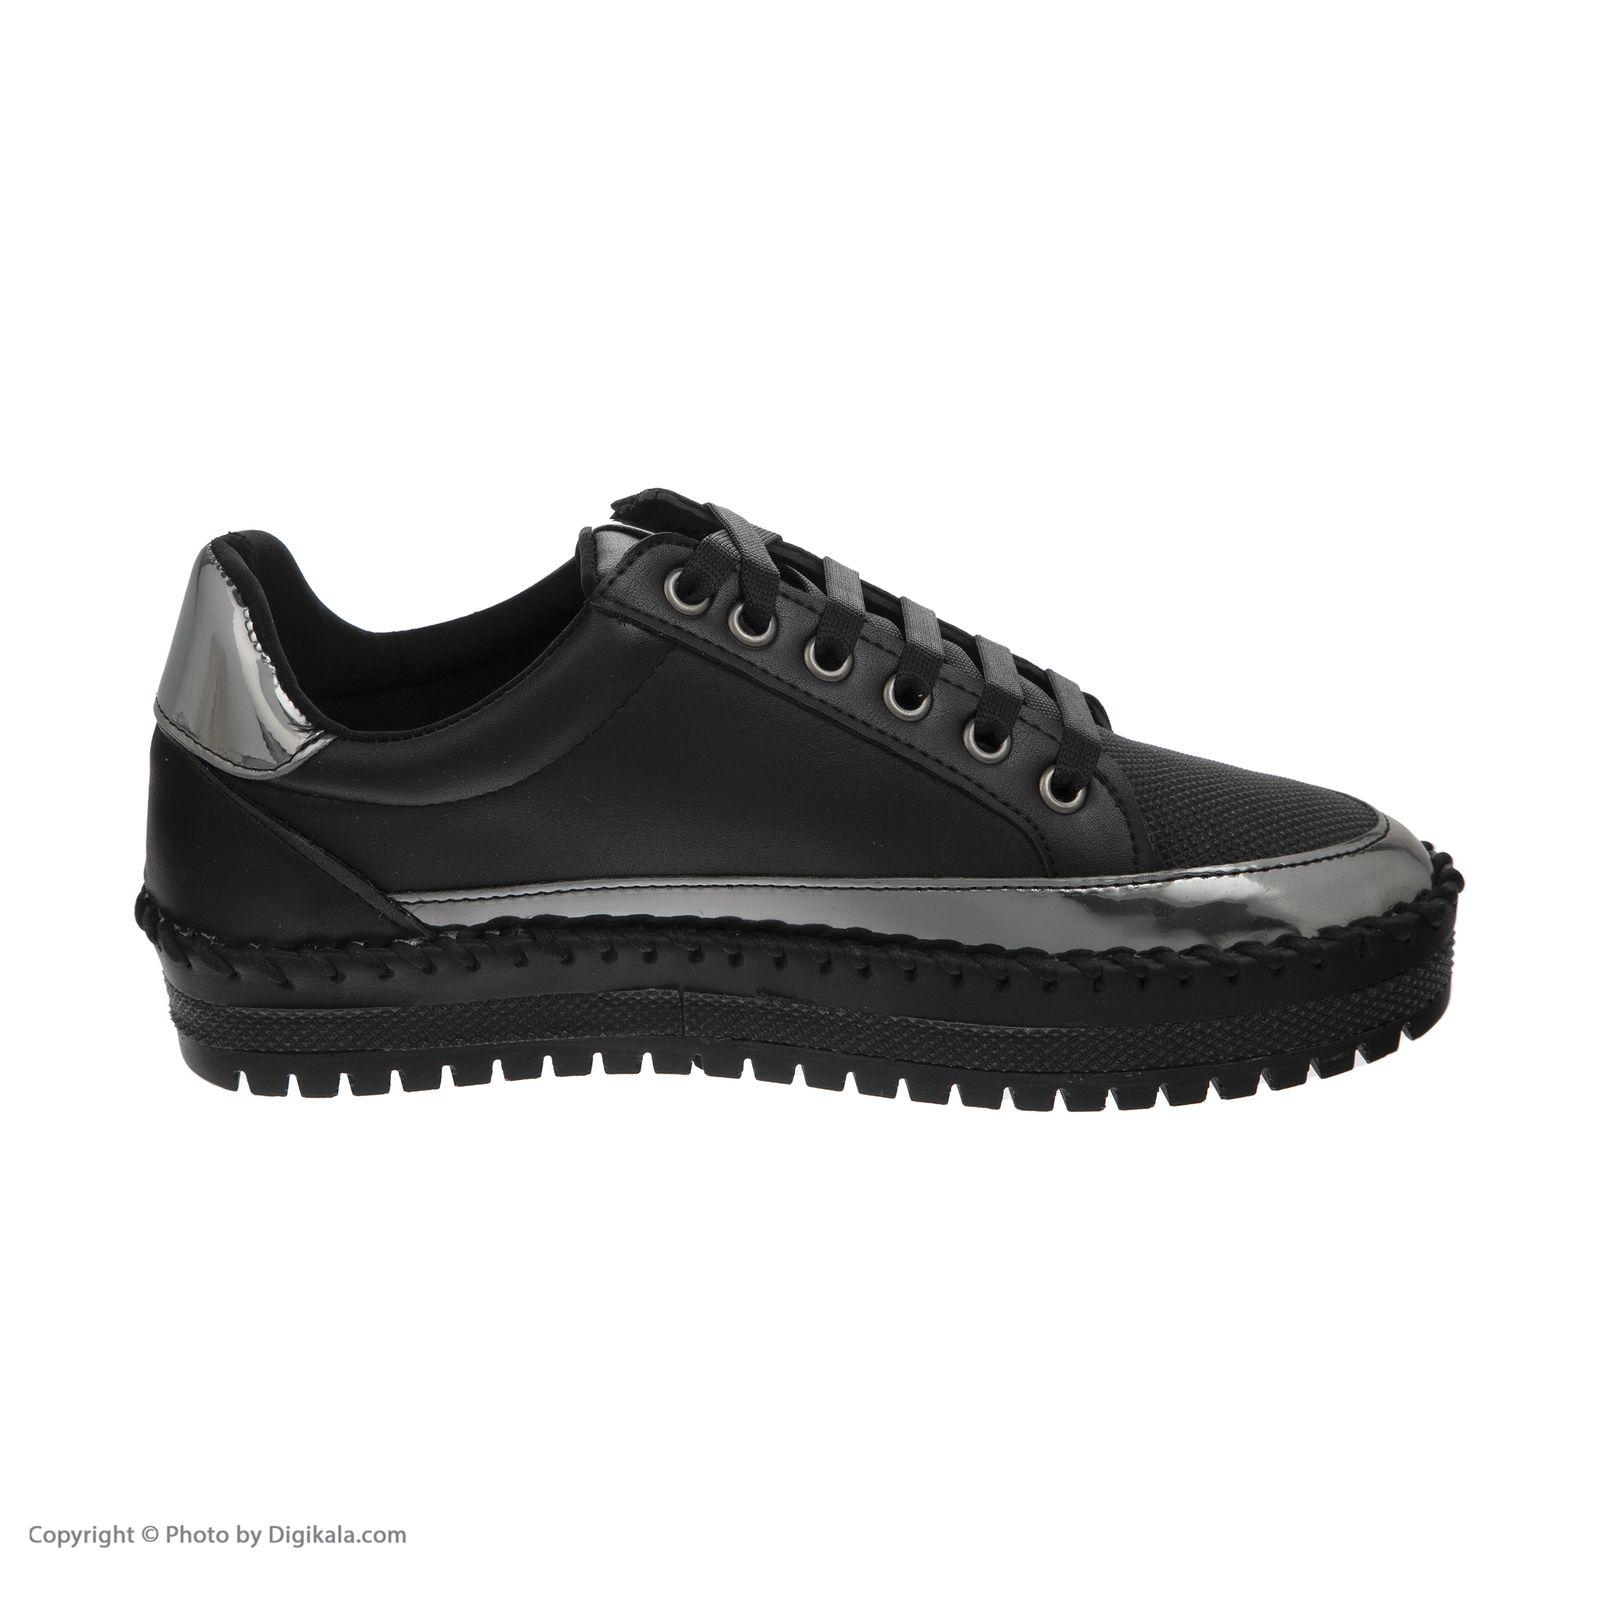 کفش روزمره زنانه ام تو مدل 99-1005 main 1 2